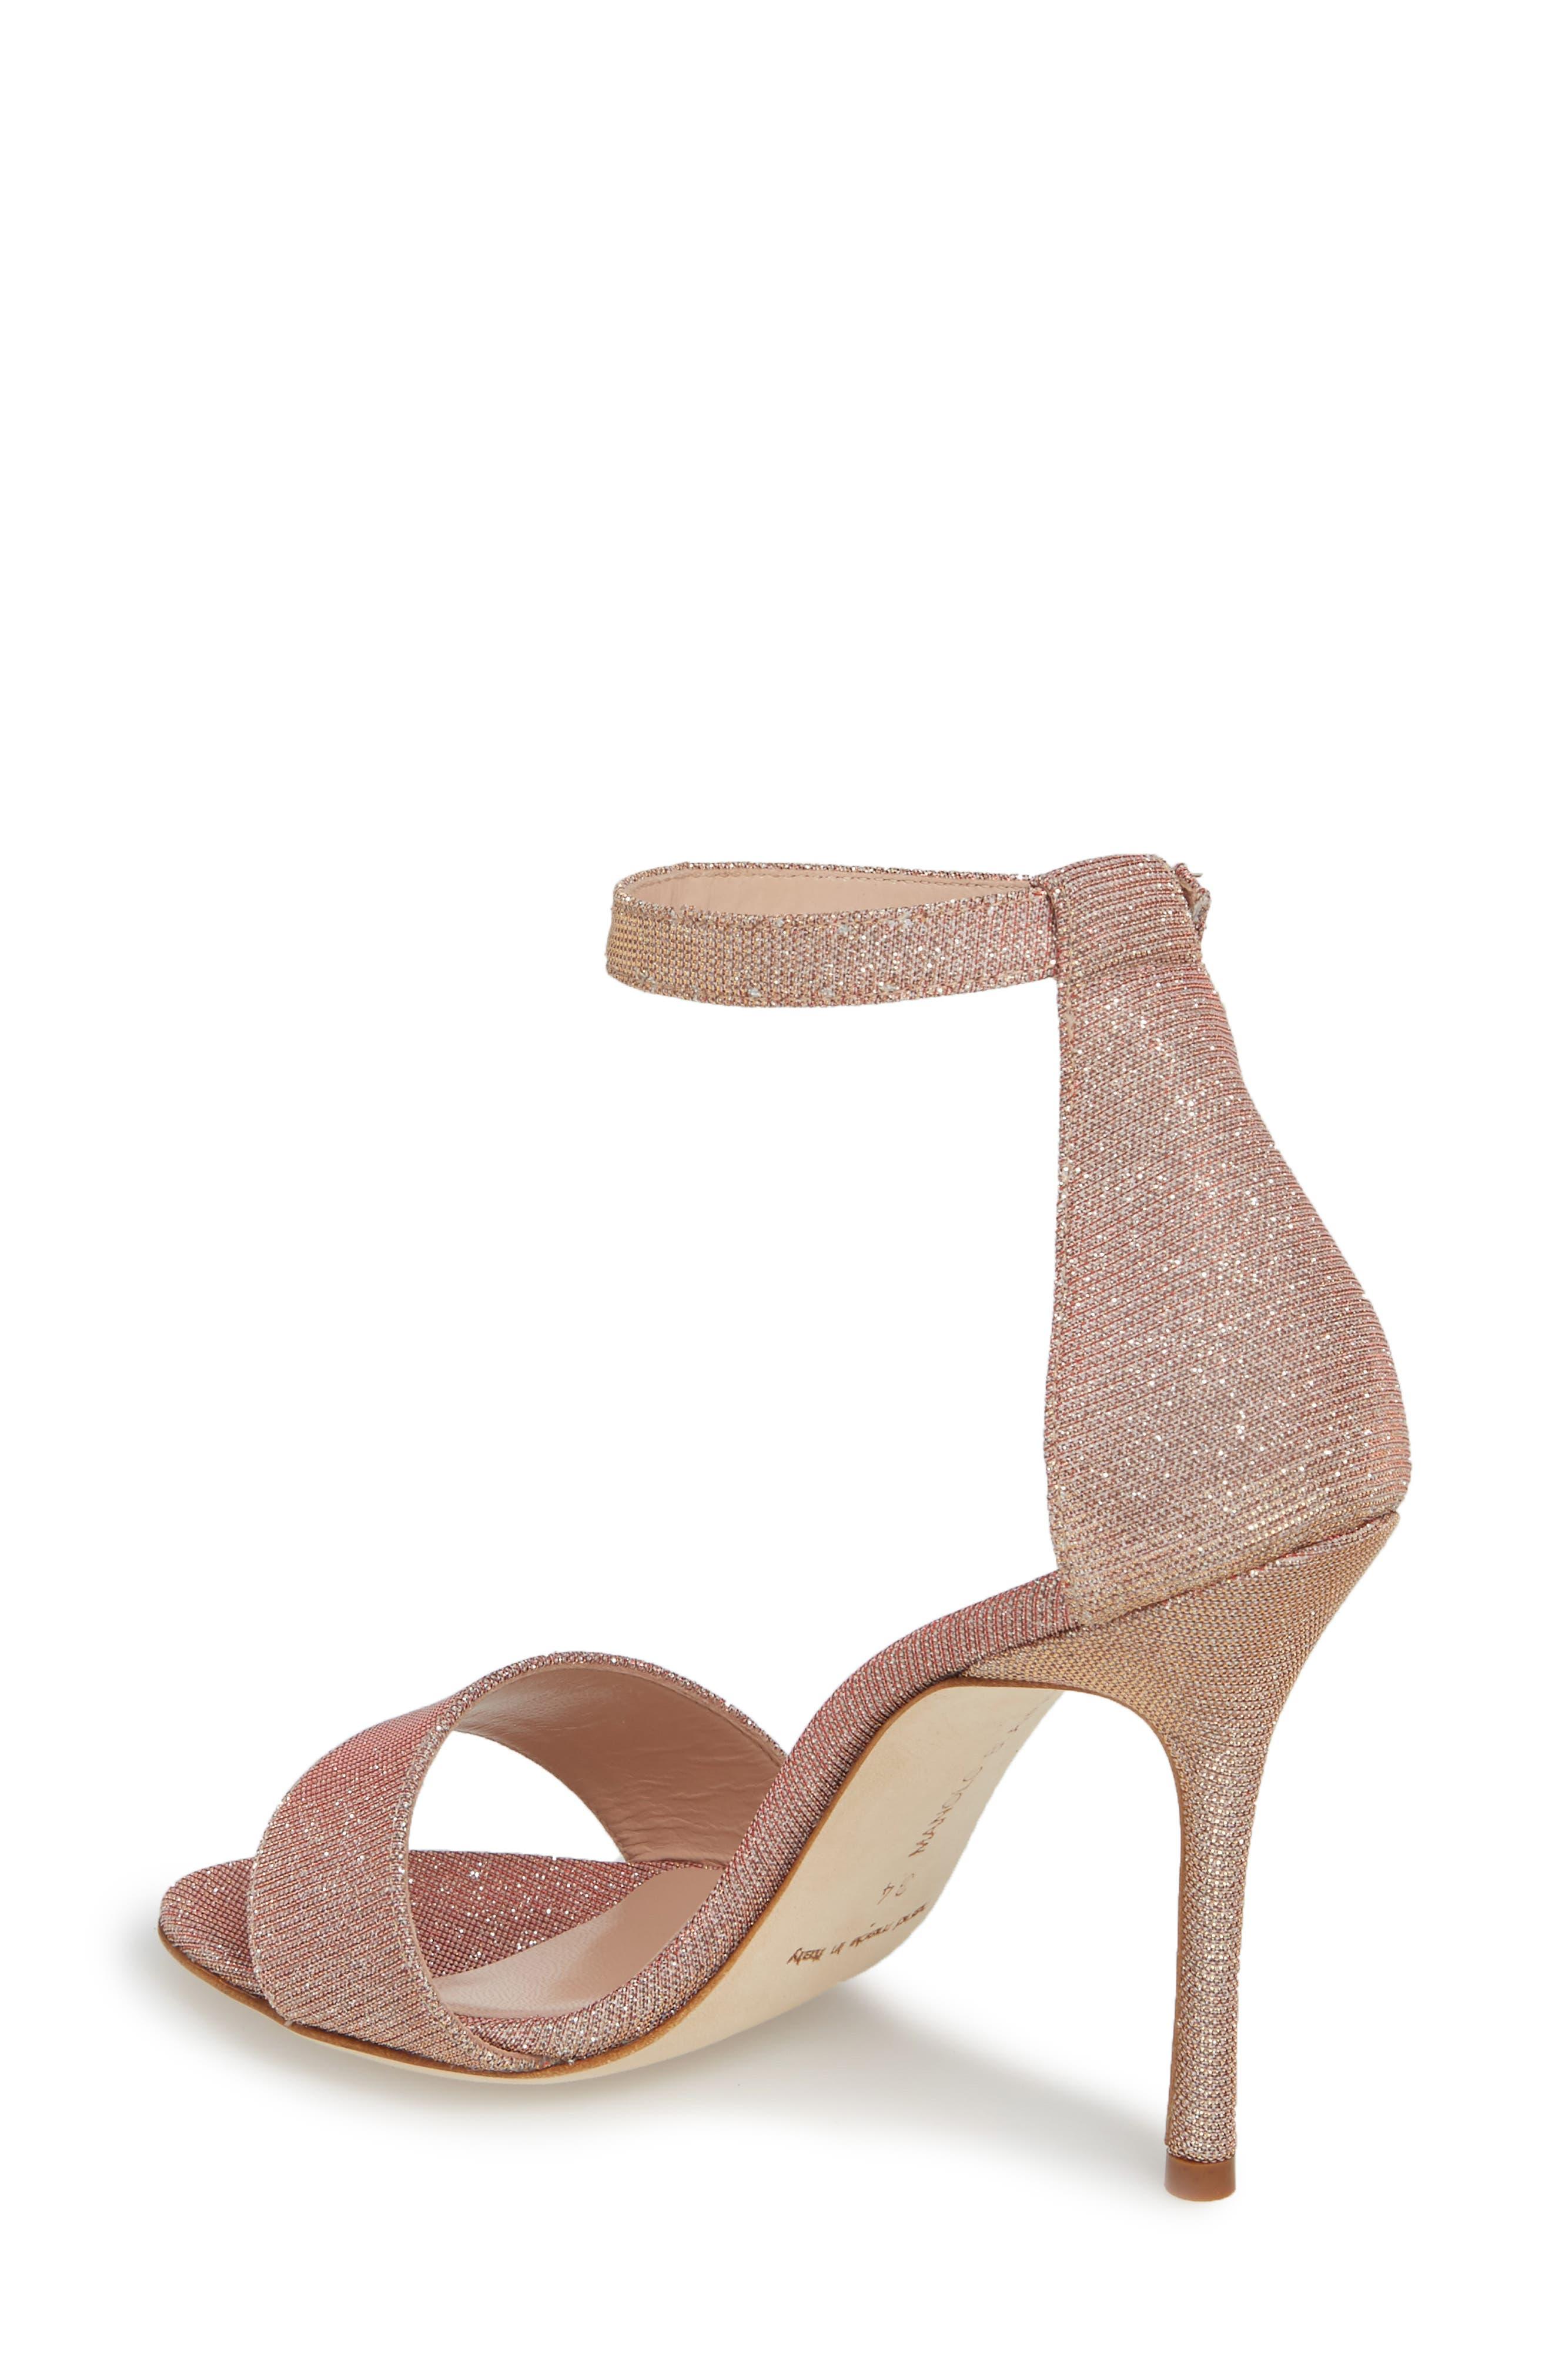 Tres Ankle Strap Sandal,                             Alternate thumbnail 2, color,                             Champagne Notturno